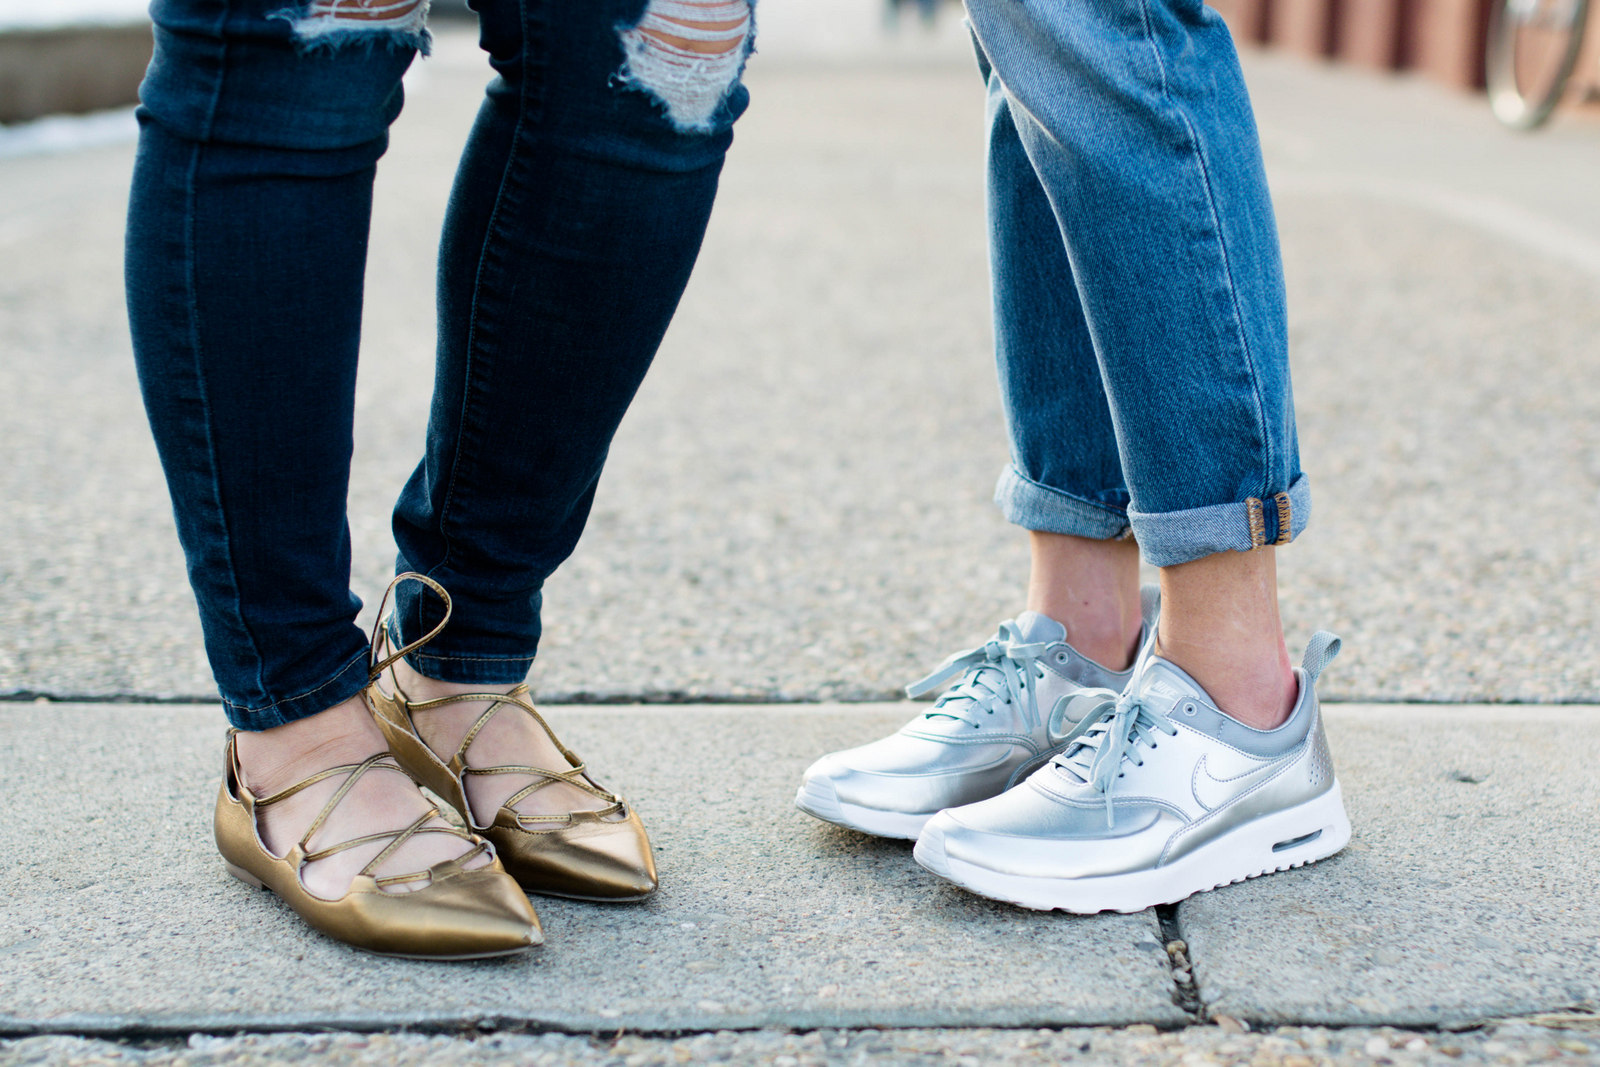 Two ways to wear metallic flats